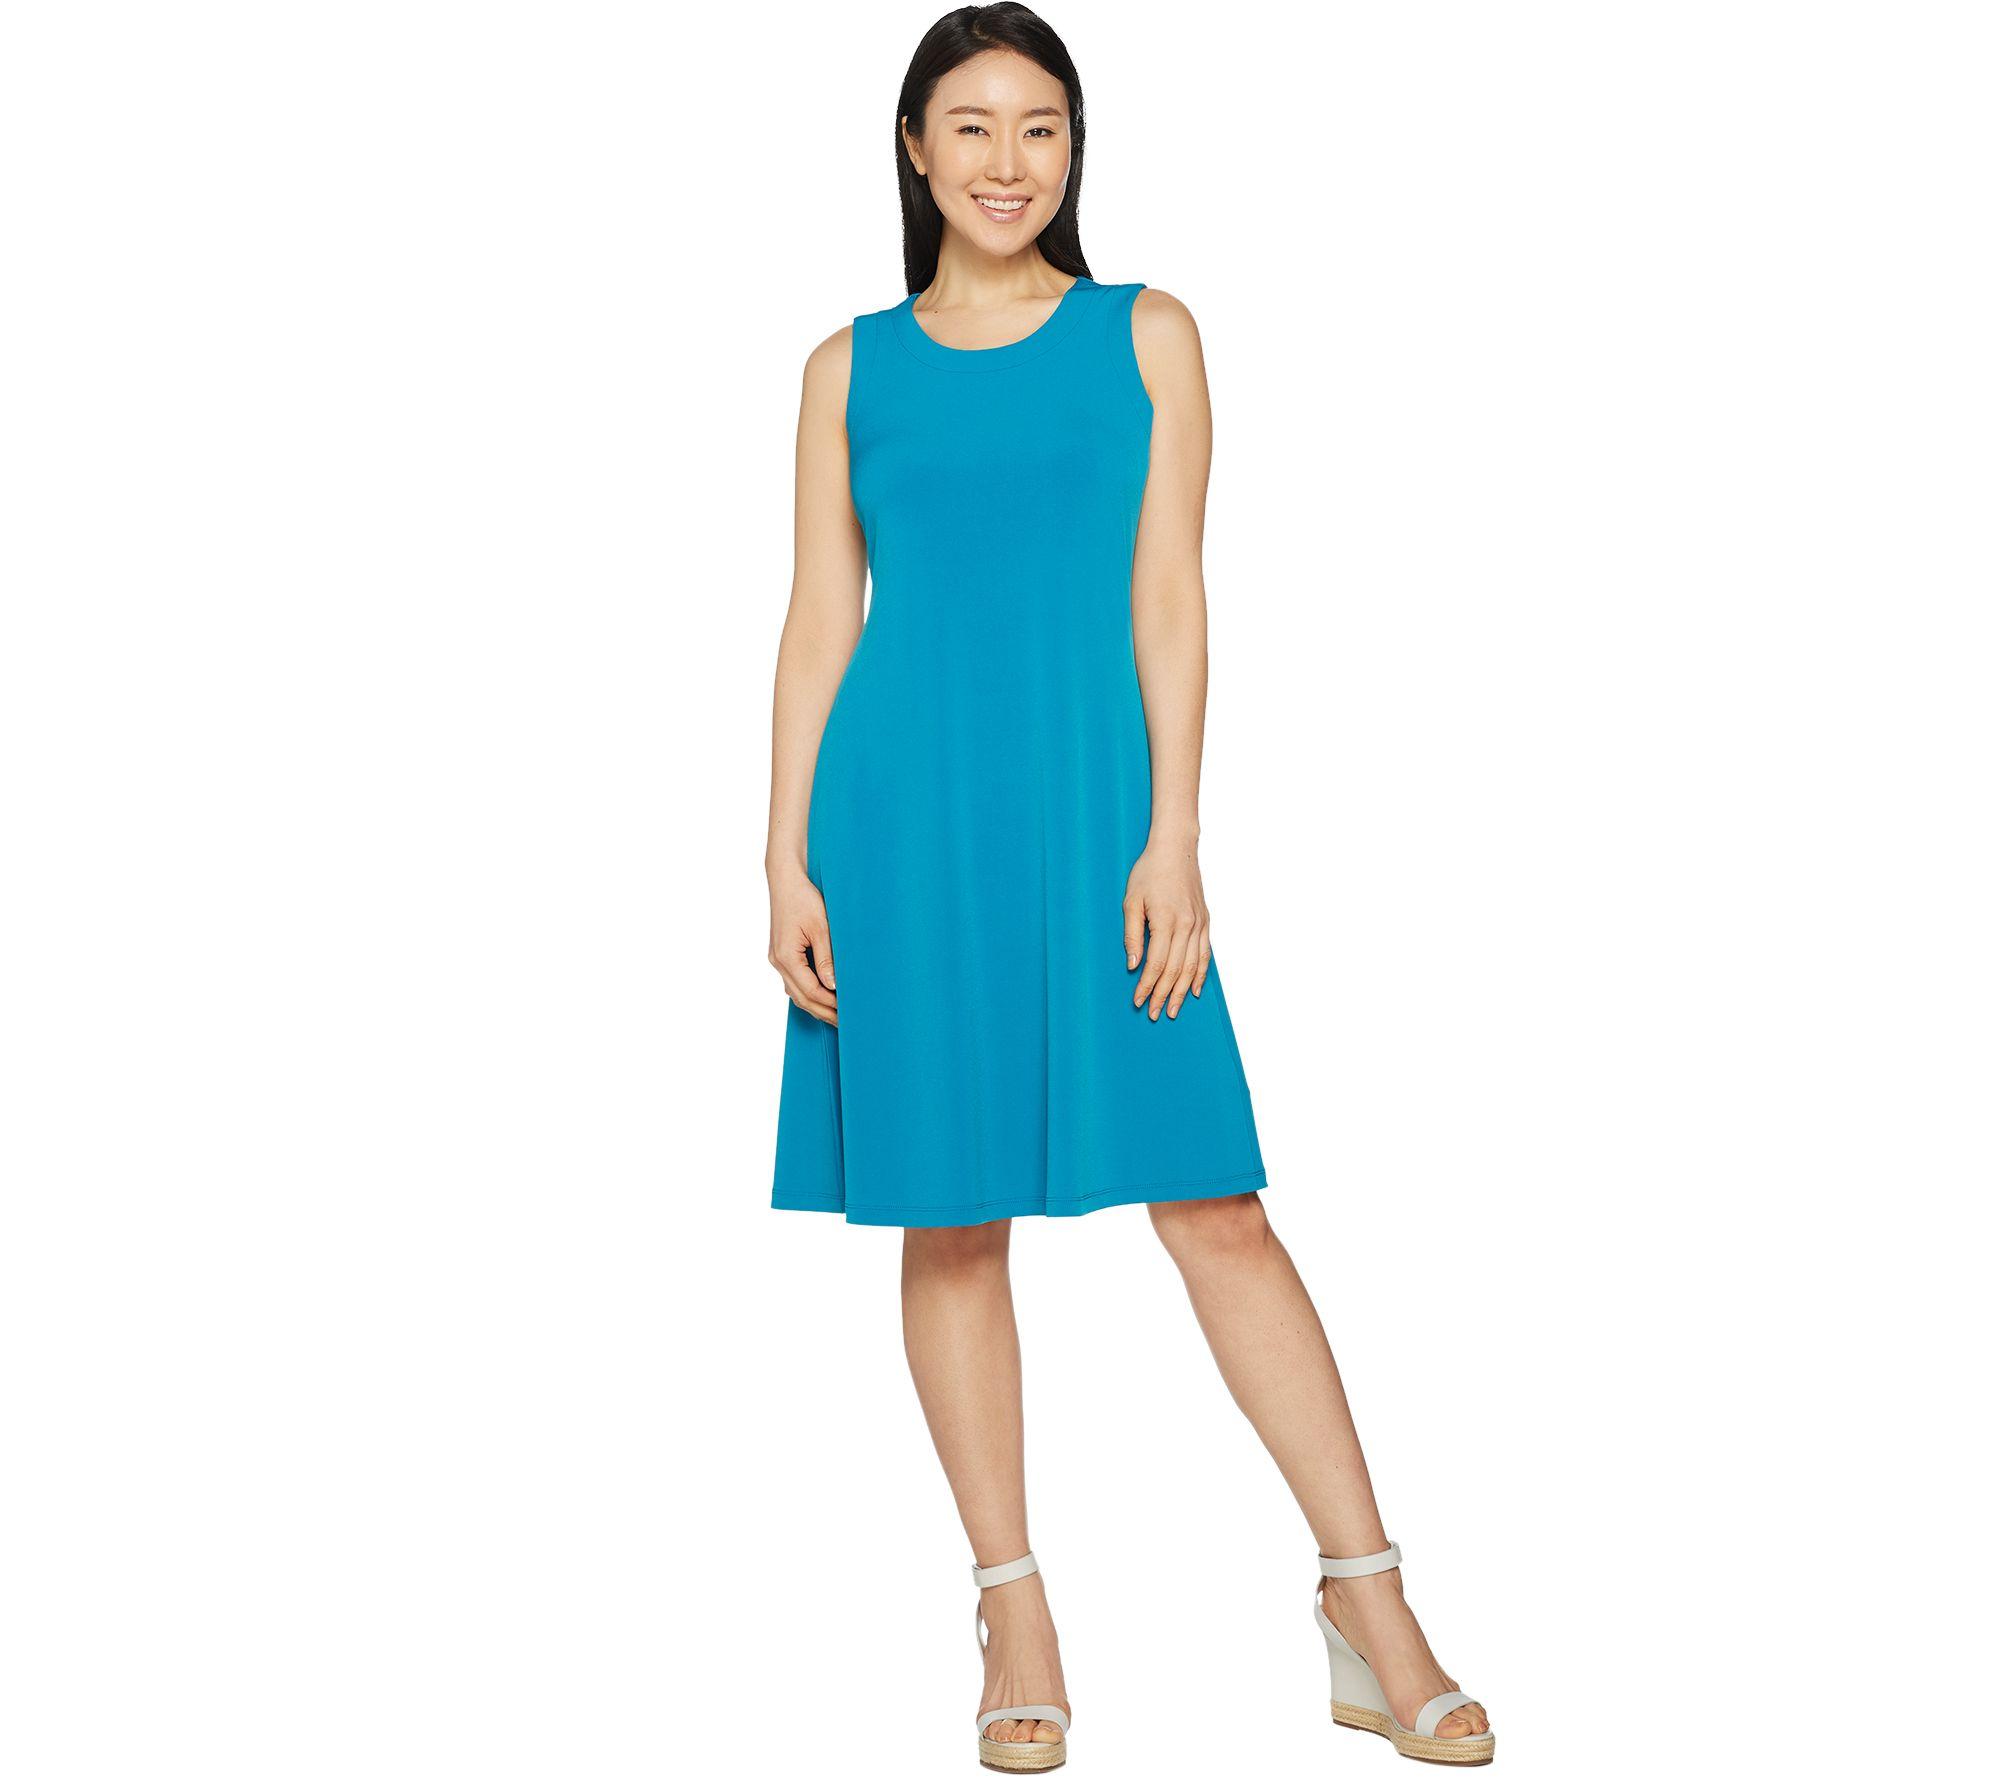 Christmas dress attire for age 57 - Susan Graver Liquid Knit Sleeveless Dress A290794